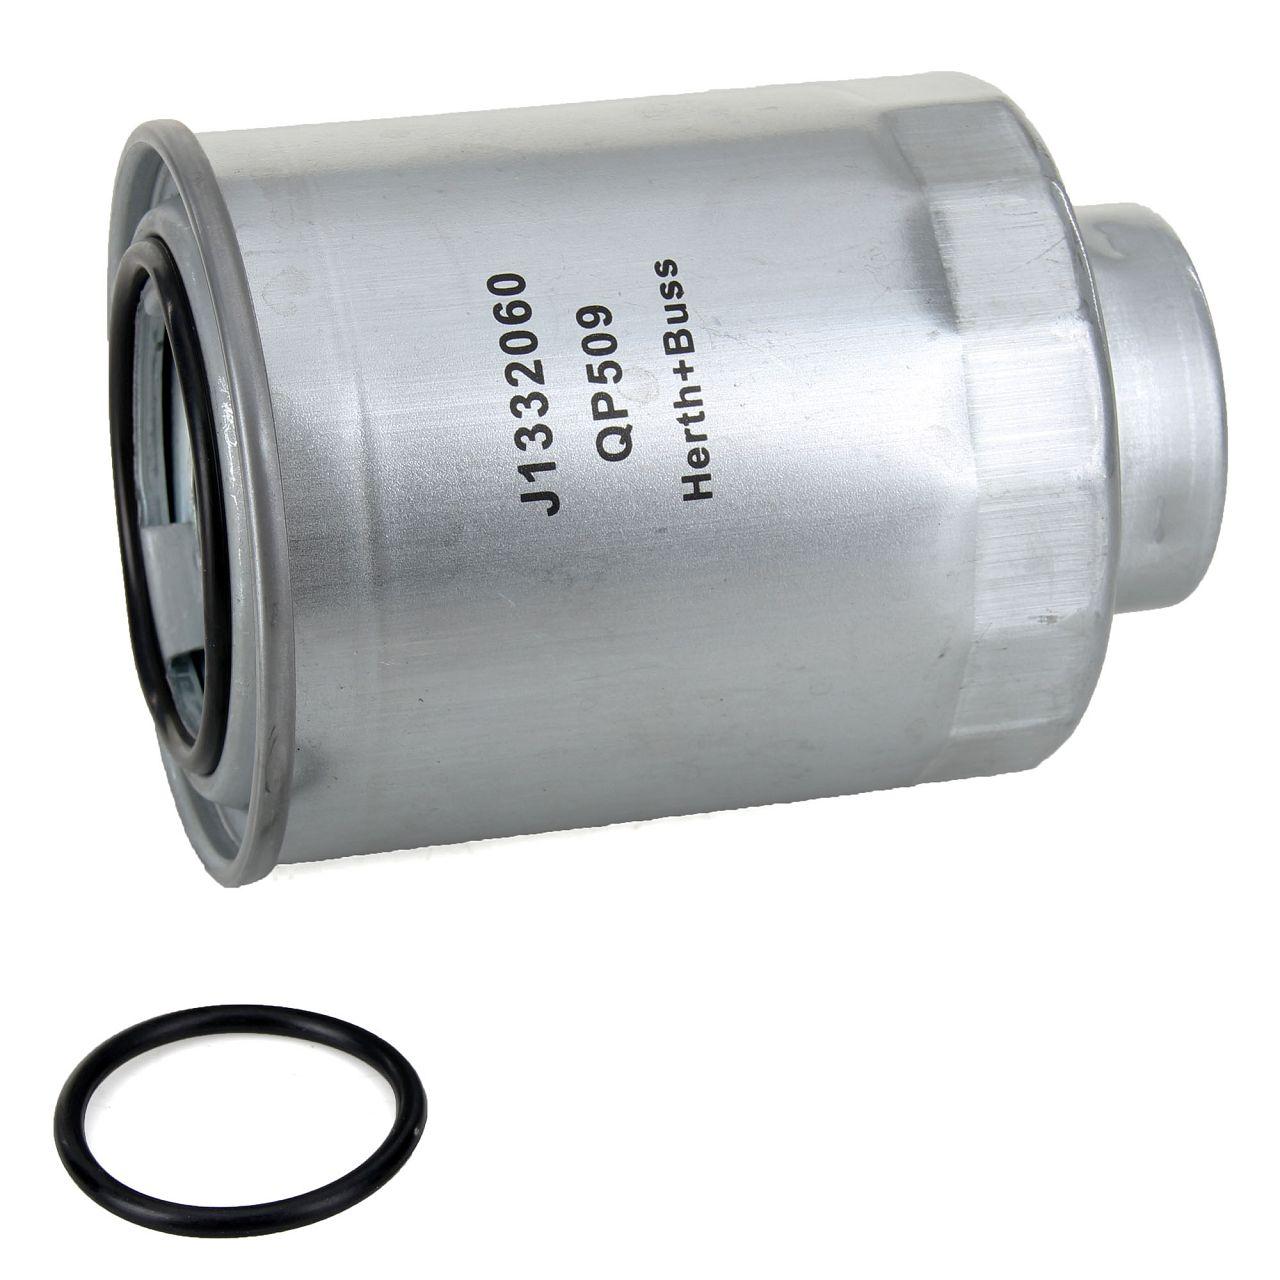 HERTH+BUSS JAKOPARTS Filterset für TOYOTA AVENSIS (T25) COROLLA 2.0 D-4D 116 PS